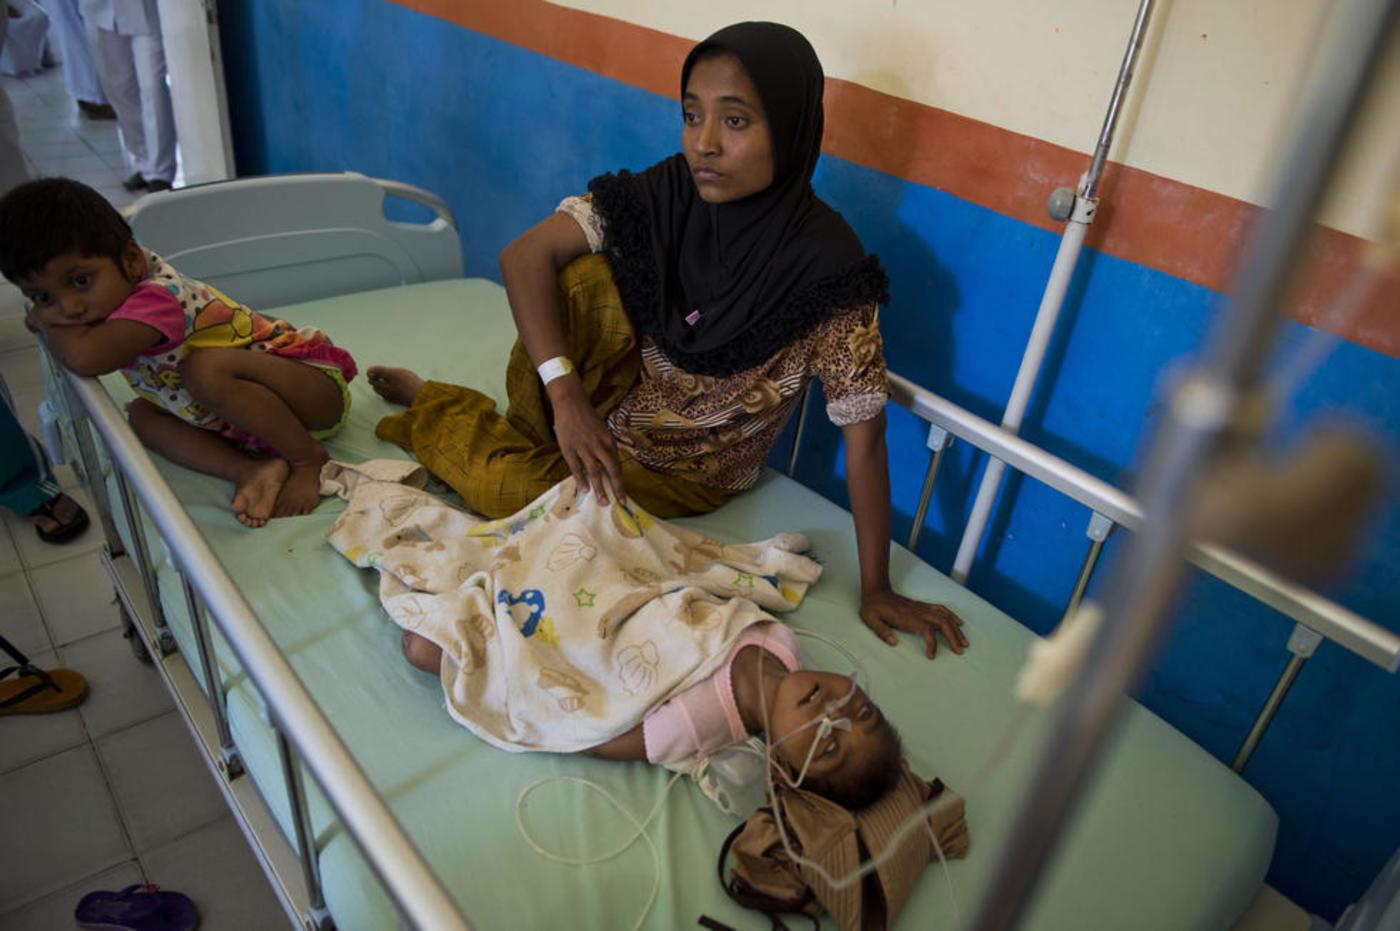 Qatar pledges $50 million to Indonesia for hosting Rohingya refugees